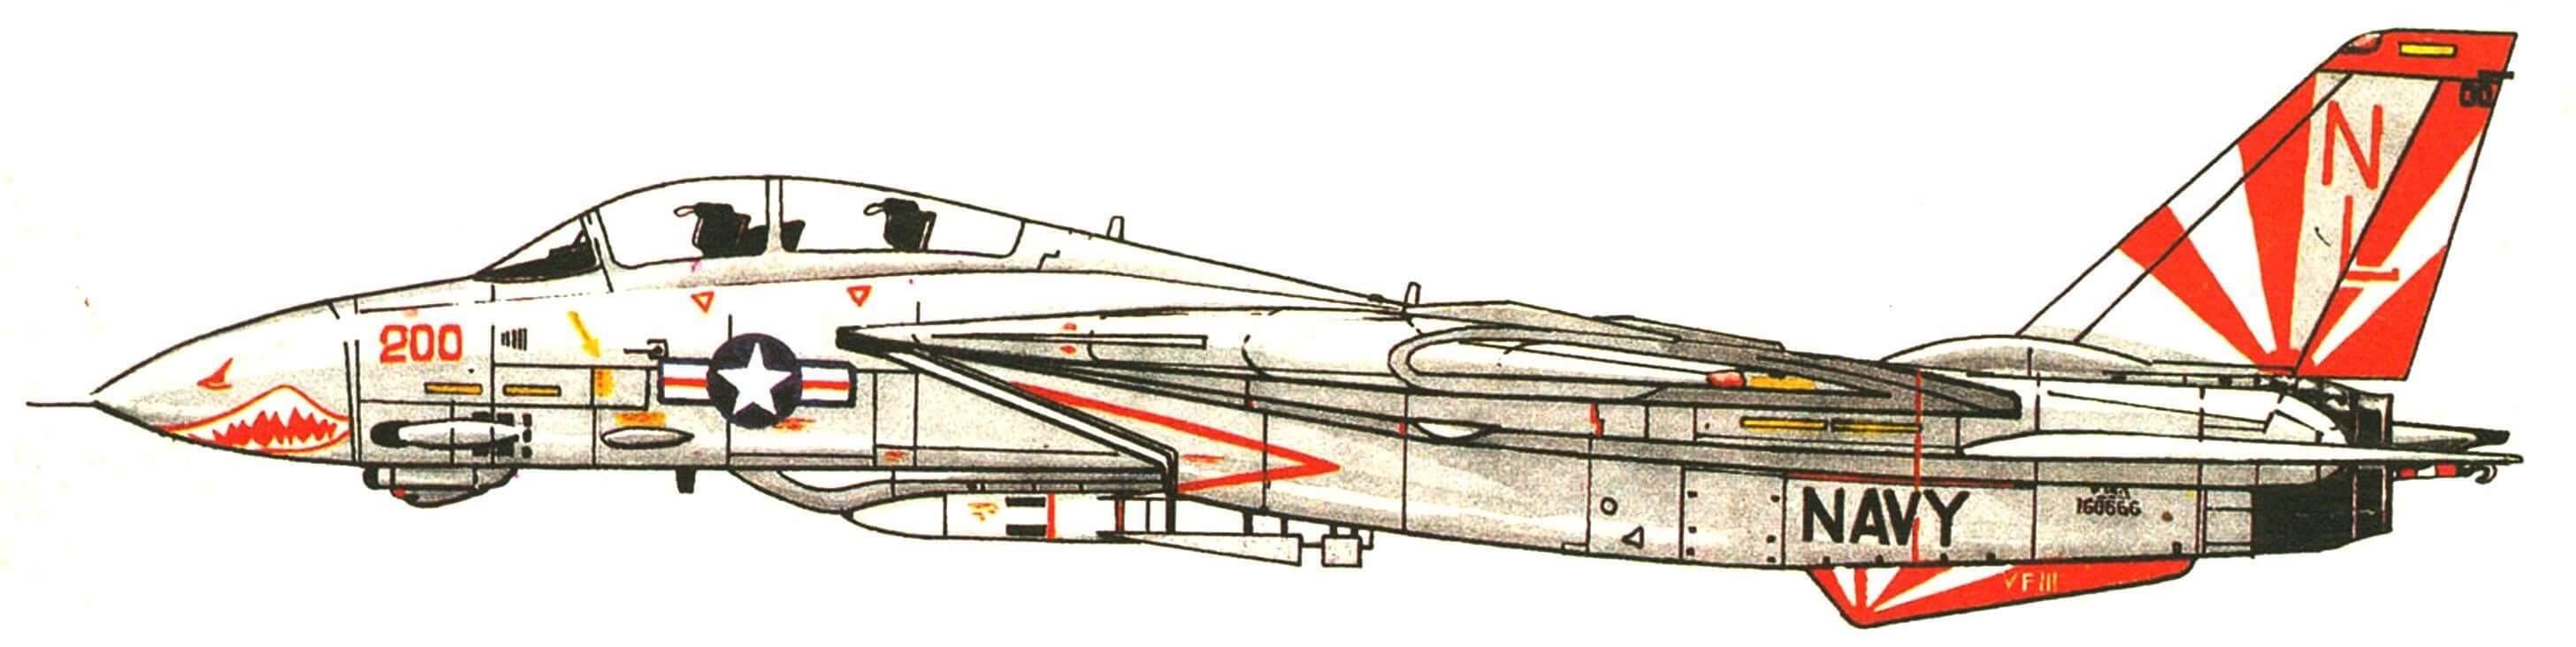 Самолет командира эскадрильи VF-111 «Sundowners». Базируется на авианосце «Caref Winson».